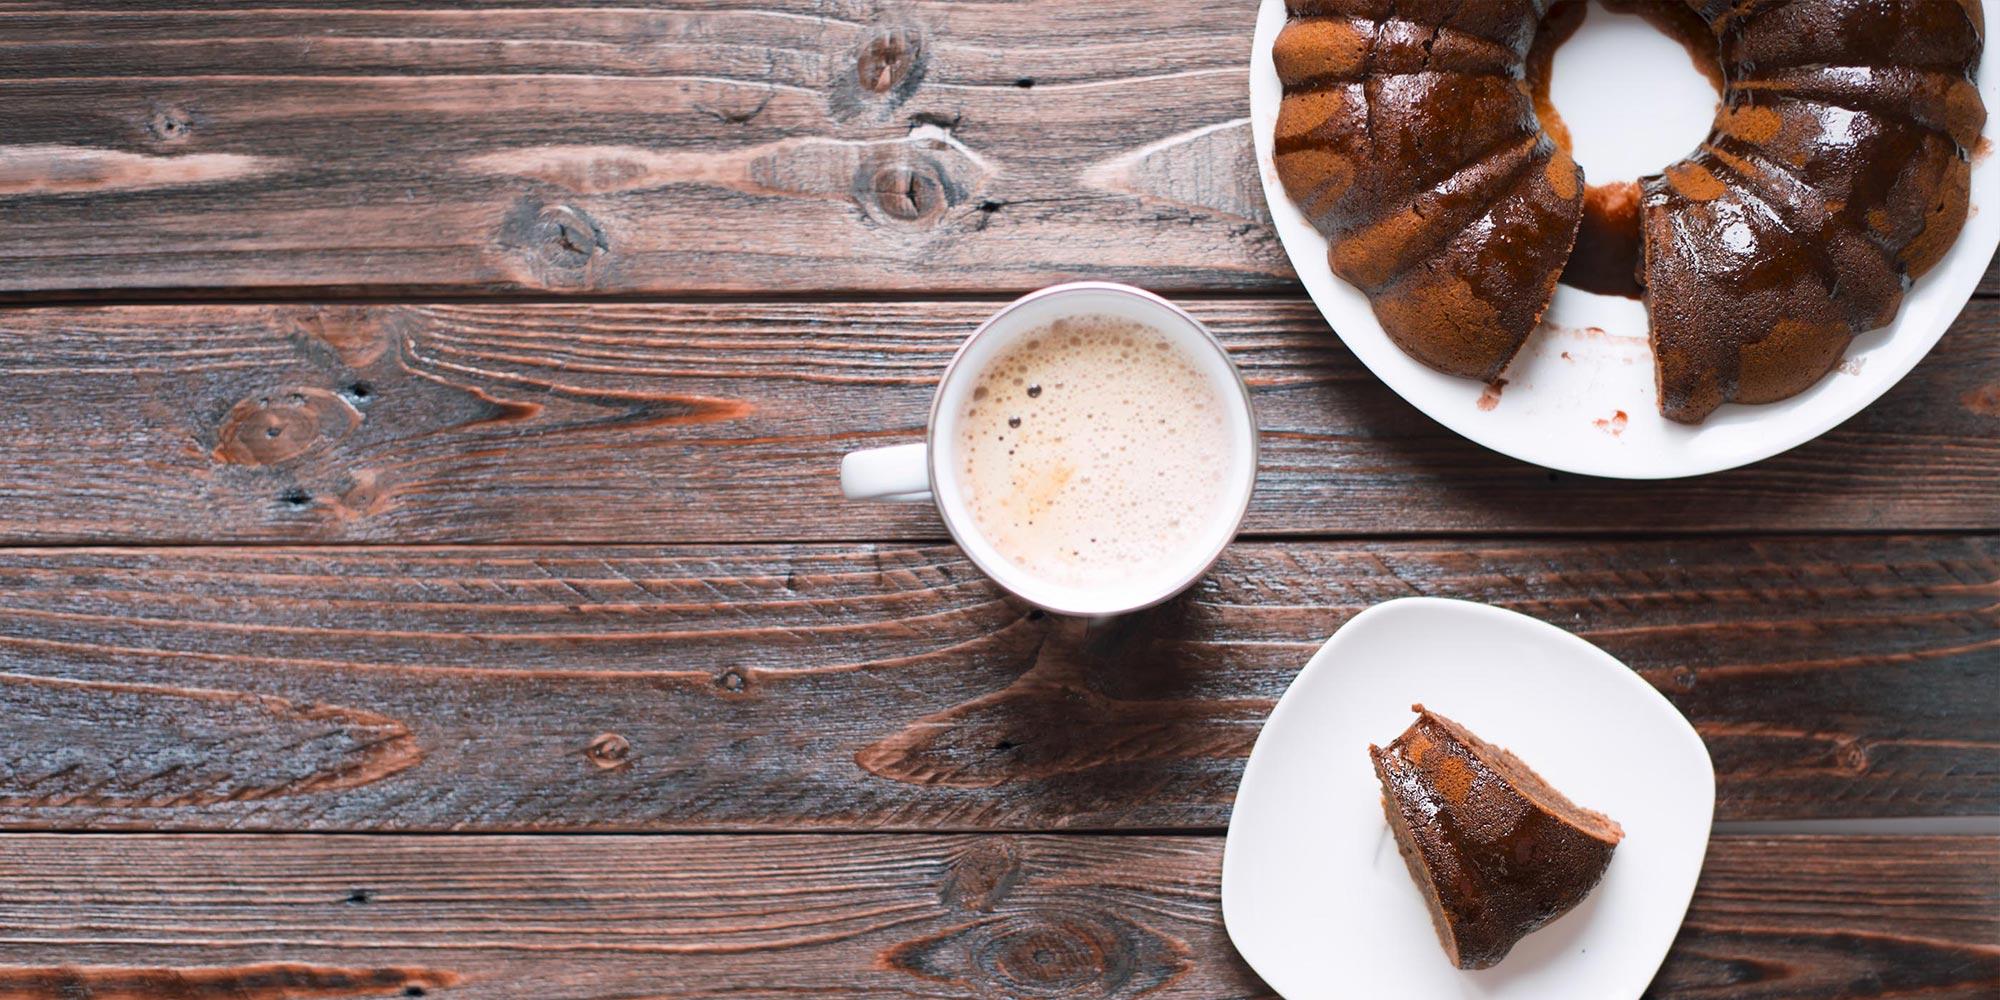 Chocolate Bundt Cake Recipe No Calorie Sweetener Sugar Substitute Splenda Sweeteners